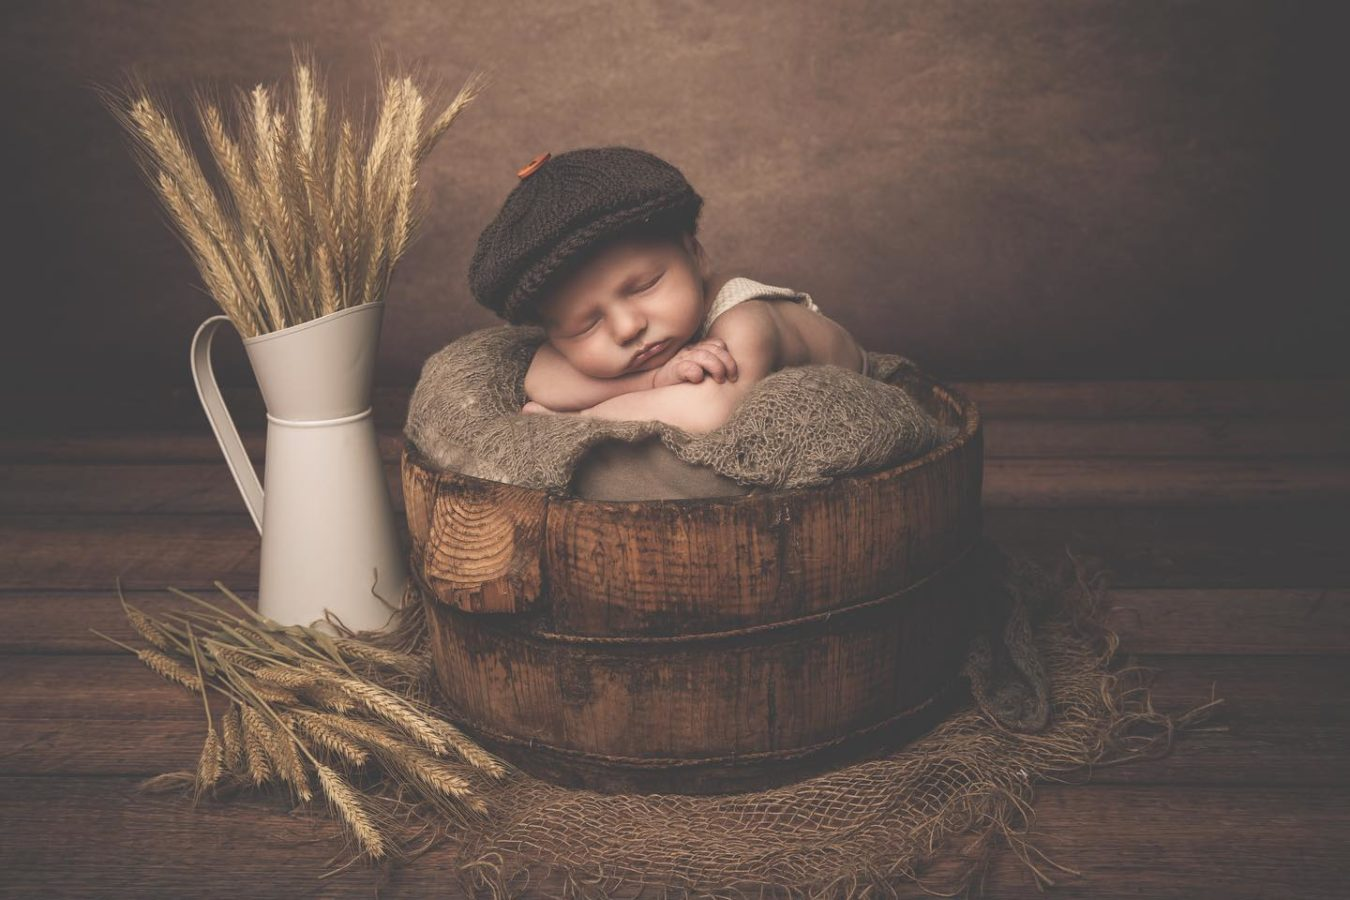 Newbornshooting, Babyshooting, Babybilder, Babyfotograf, Babyfotografin, Fotografin Ausburg, Baby,  Shooting, Newbornfotograf,